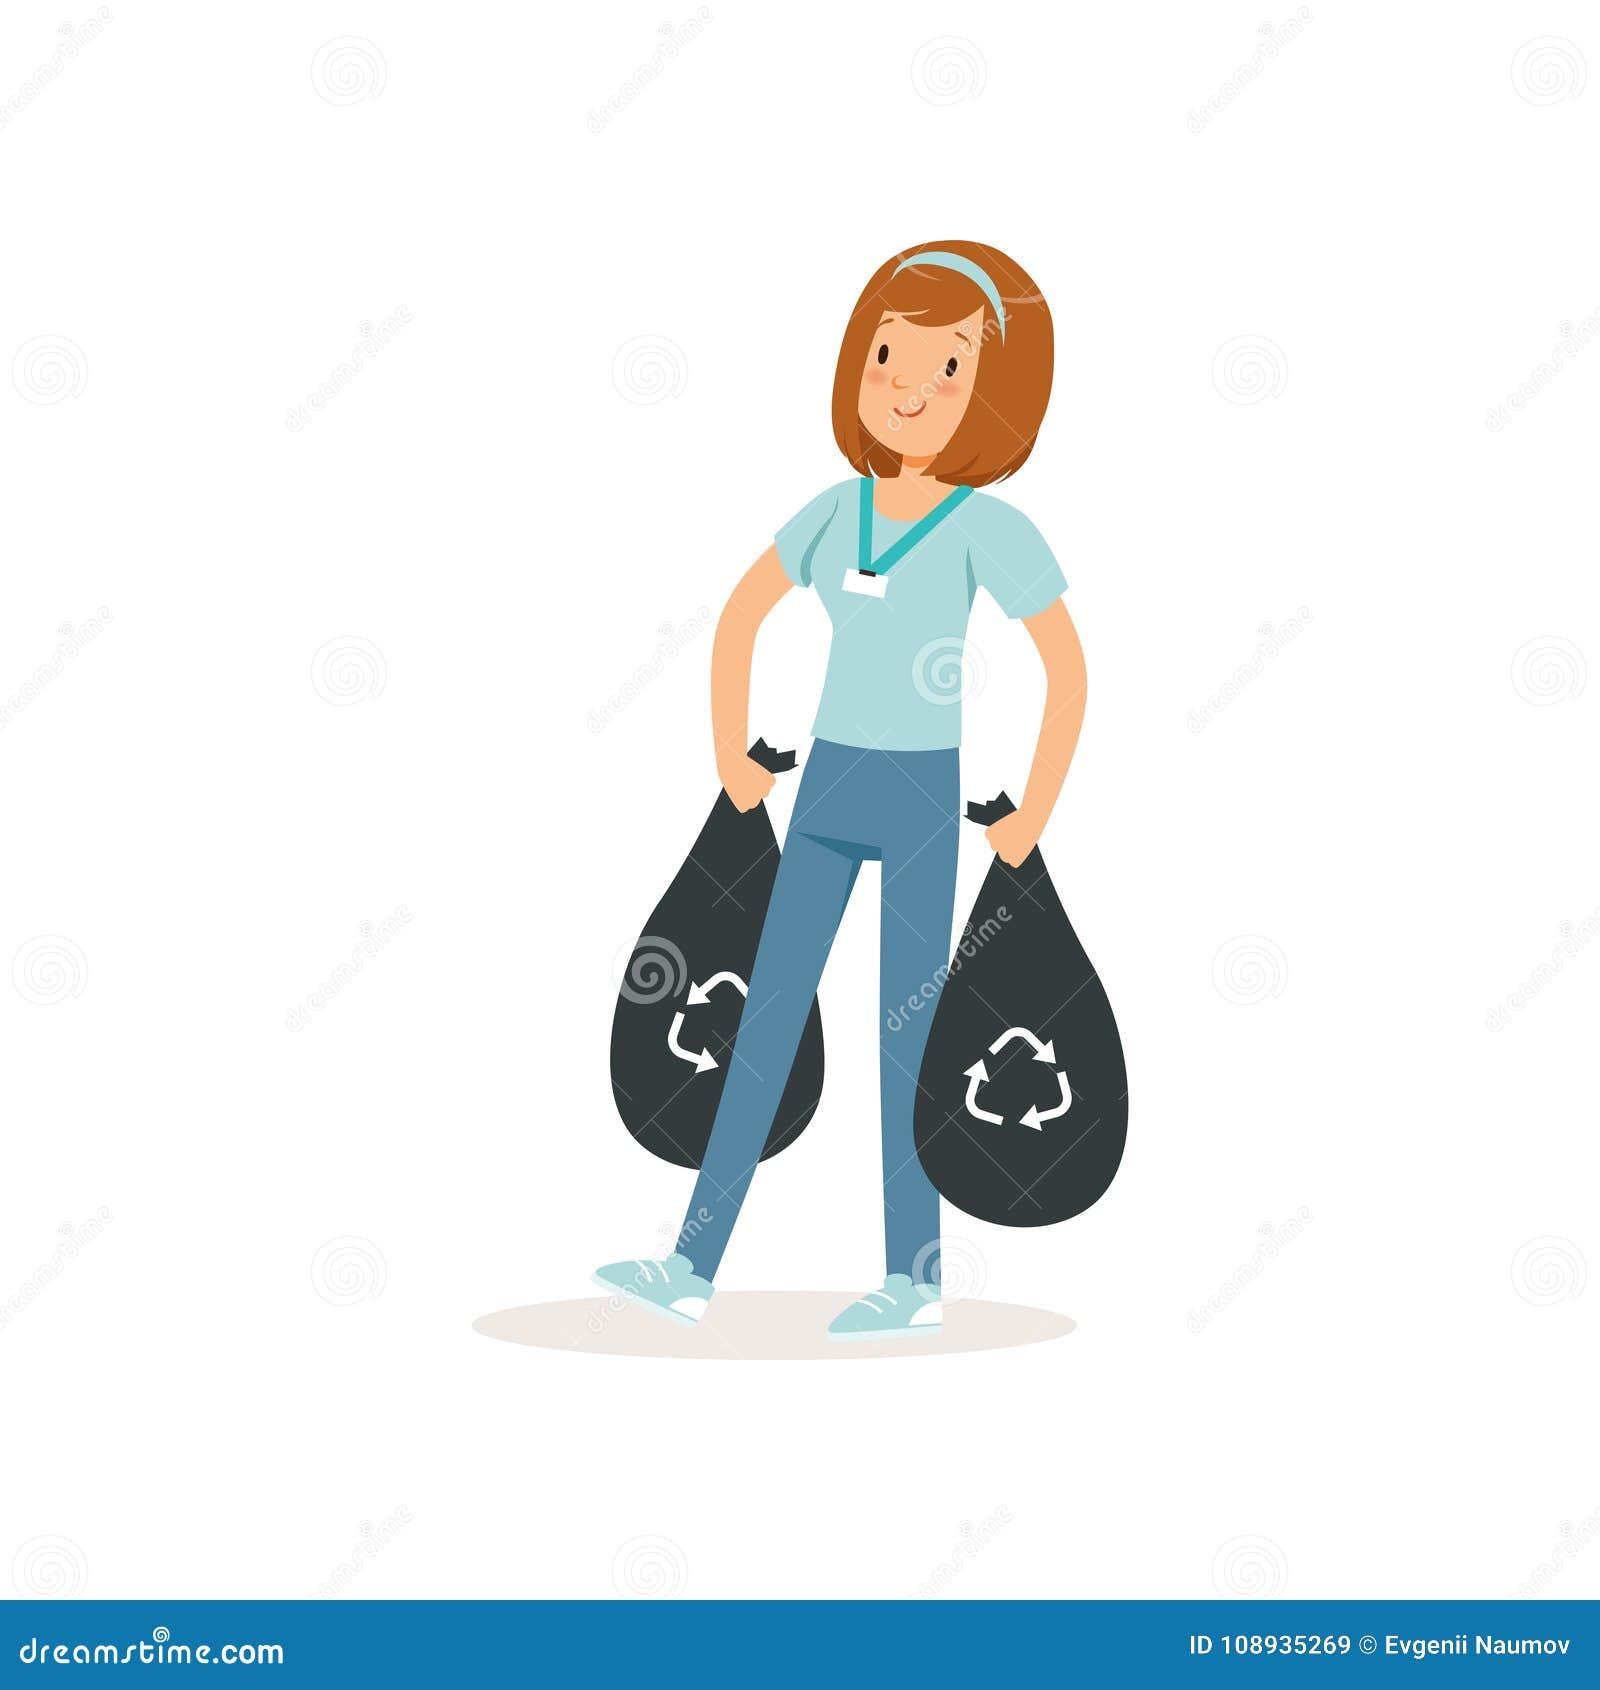 Liu jo borsa shopping bag l anna giallo senape N65080E0087 Colore Gial www ditano com arancione Ecopelle